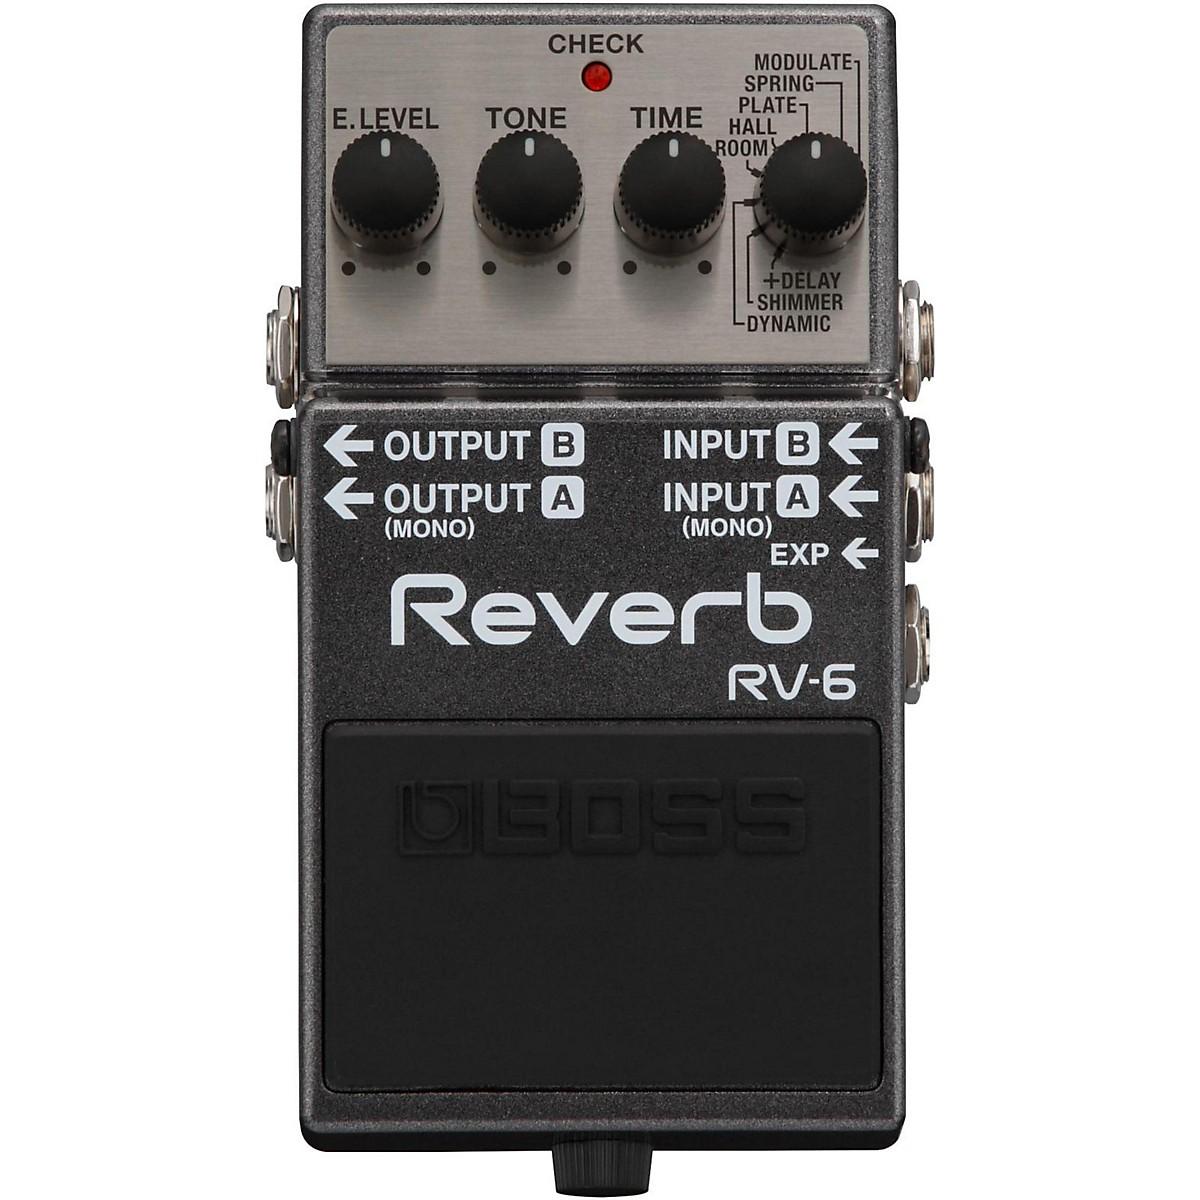 Boss RV-6 Digital Delay/Reverb Guitar Effects Pedal